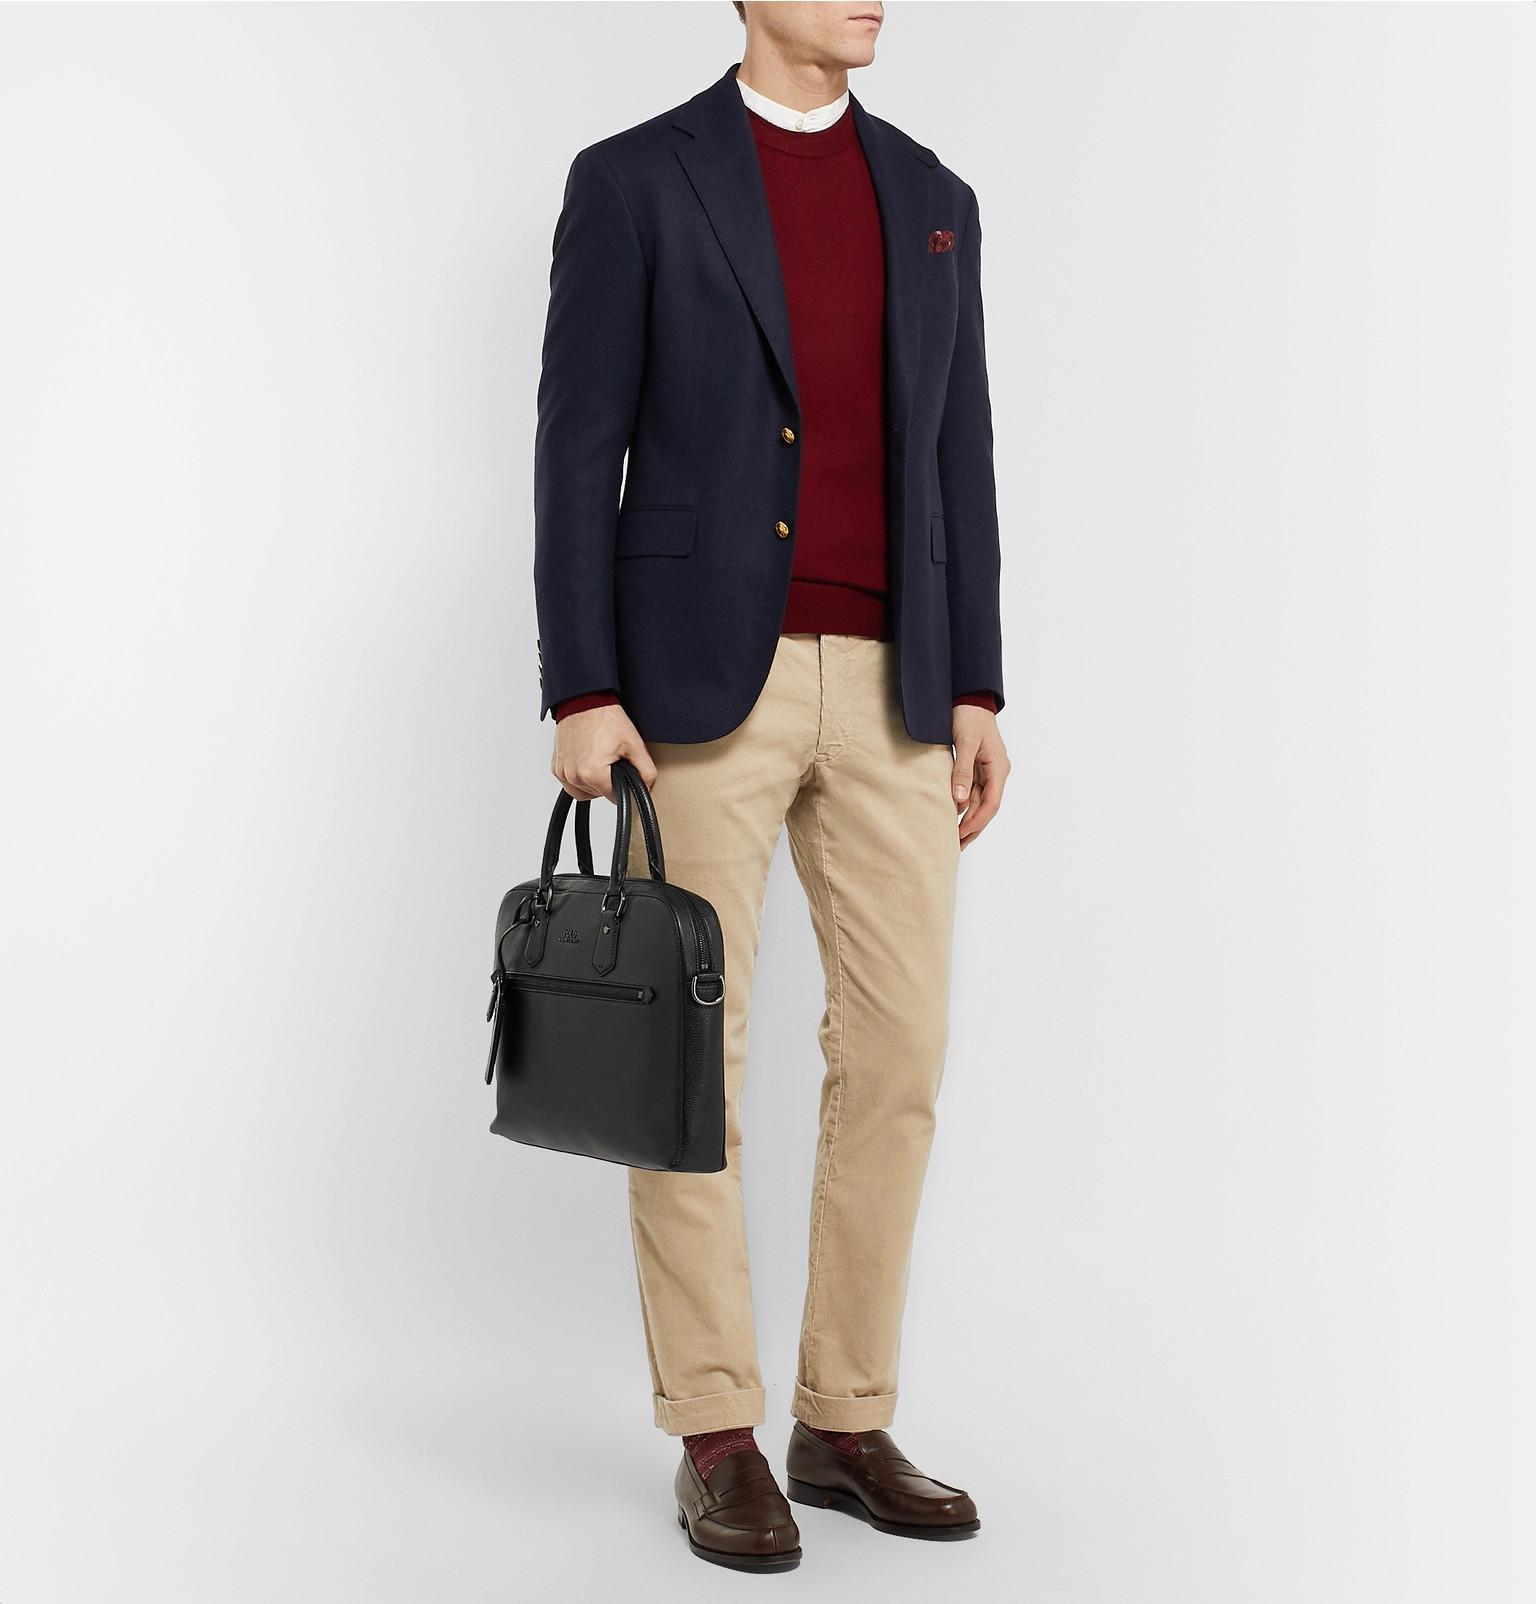 0a1e93afecf5 Polo Ralph Lauren - Black Pebble-grain Leather Briefcase for Men - Lyst.  View fullscreen